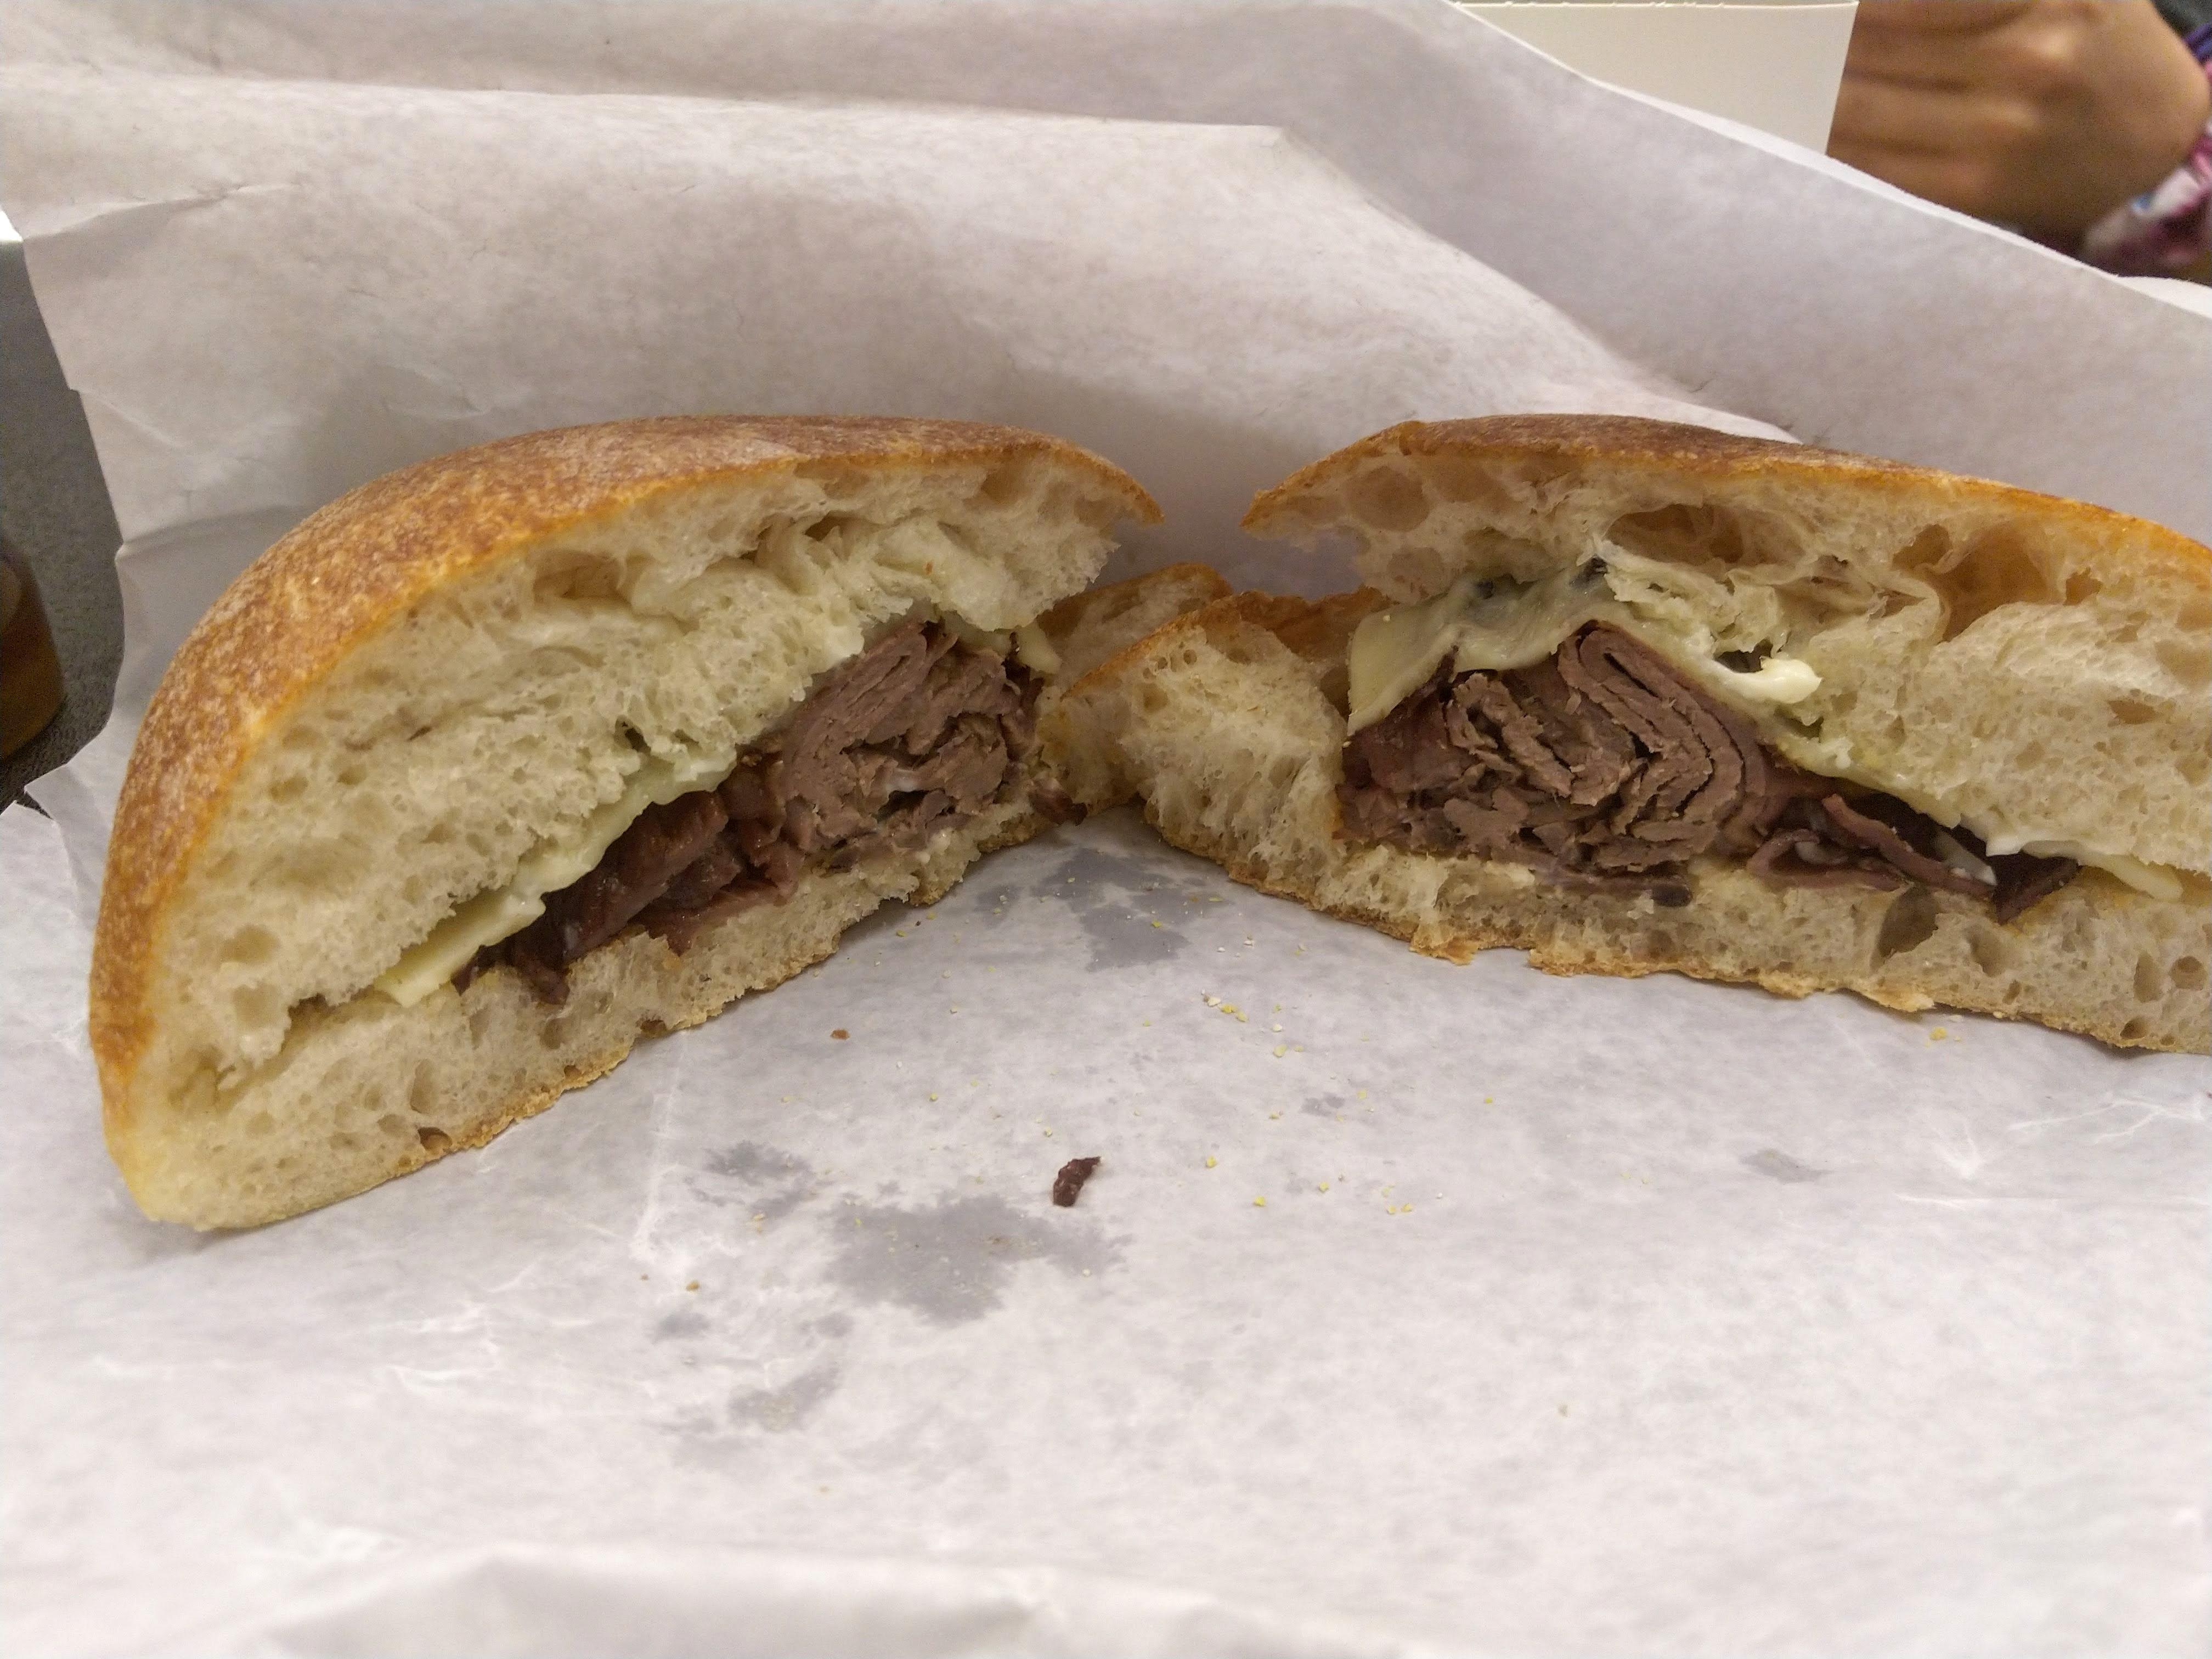 a steak and cheese sandwich